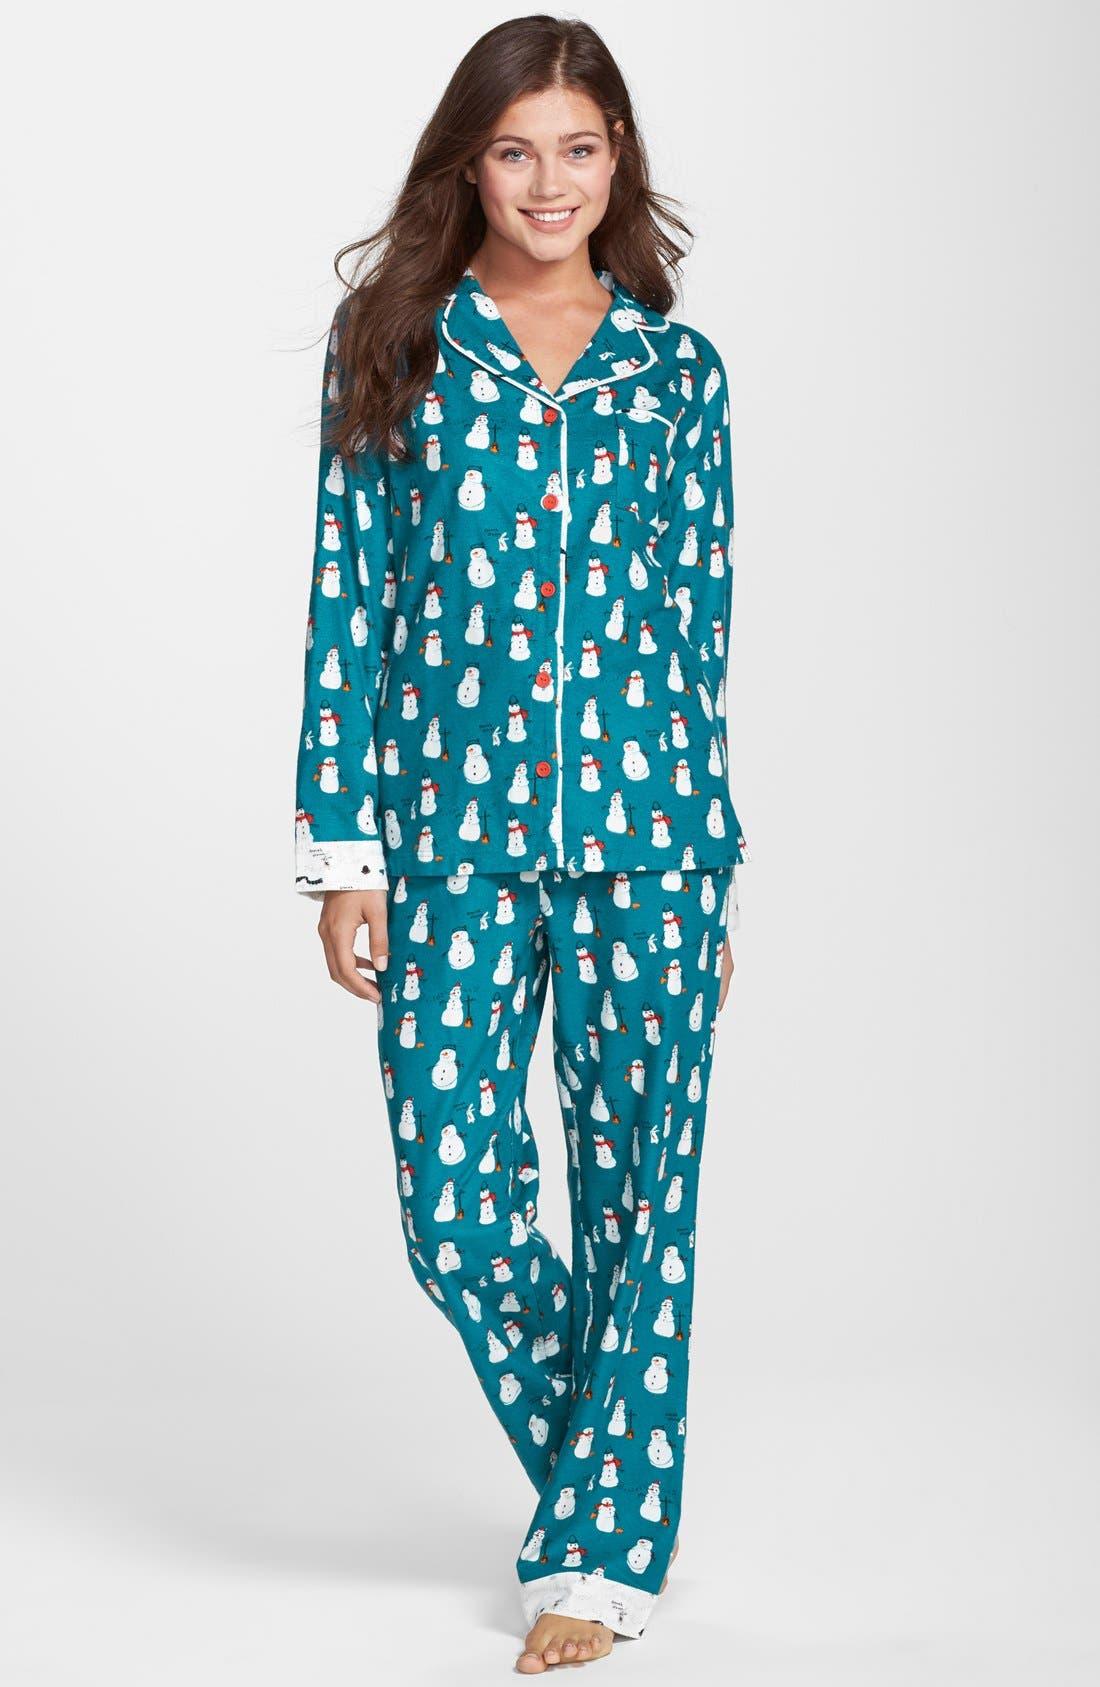 Main Image - Munki Munki Flannel Pajamas